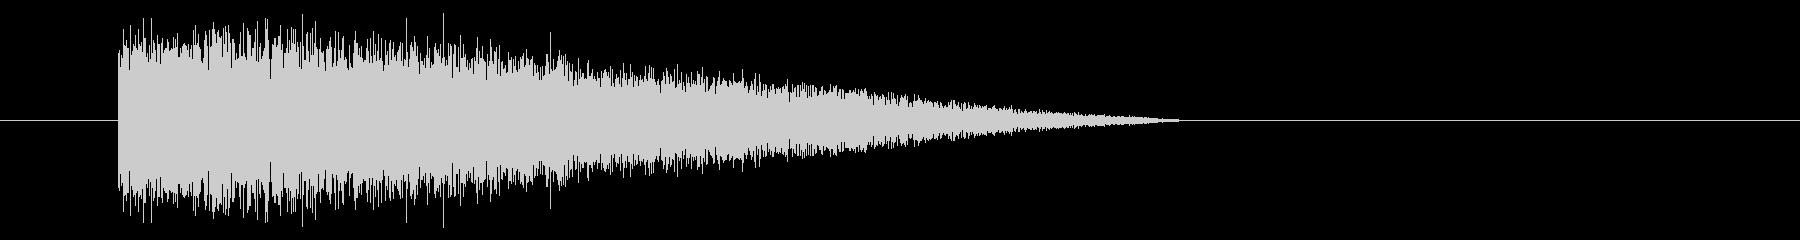 SNES-RPG04-08(魔法 氷1)の未再生の波形